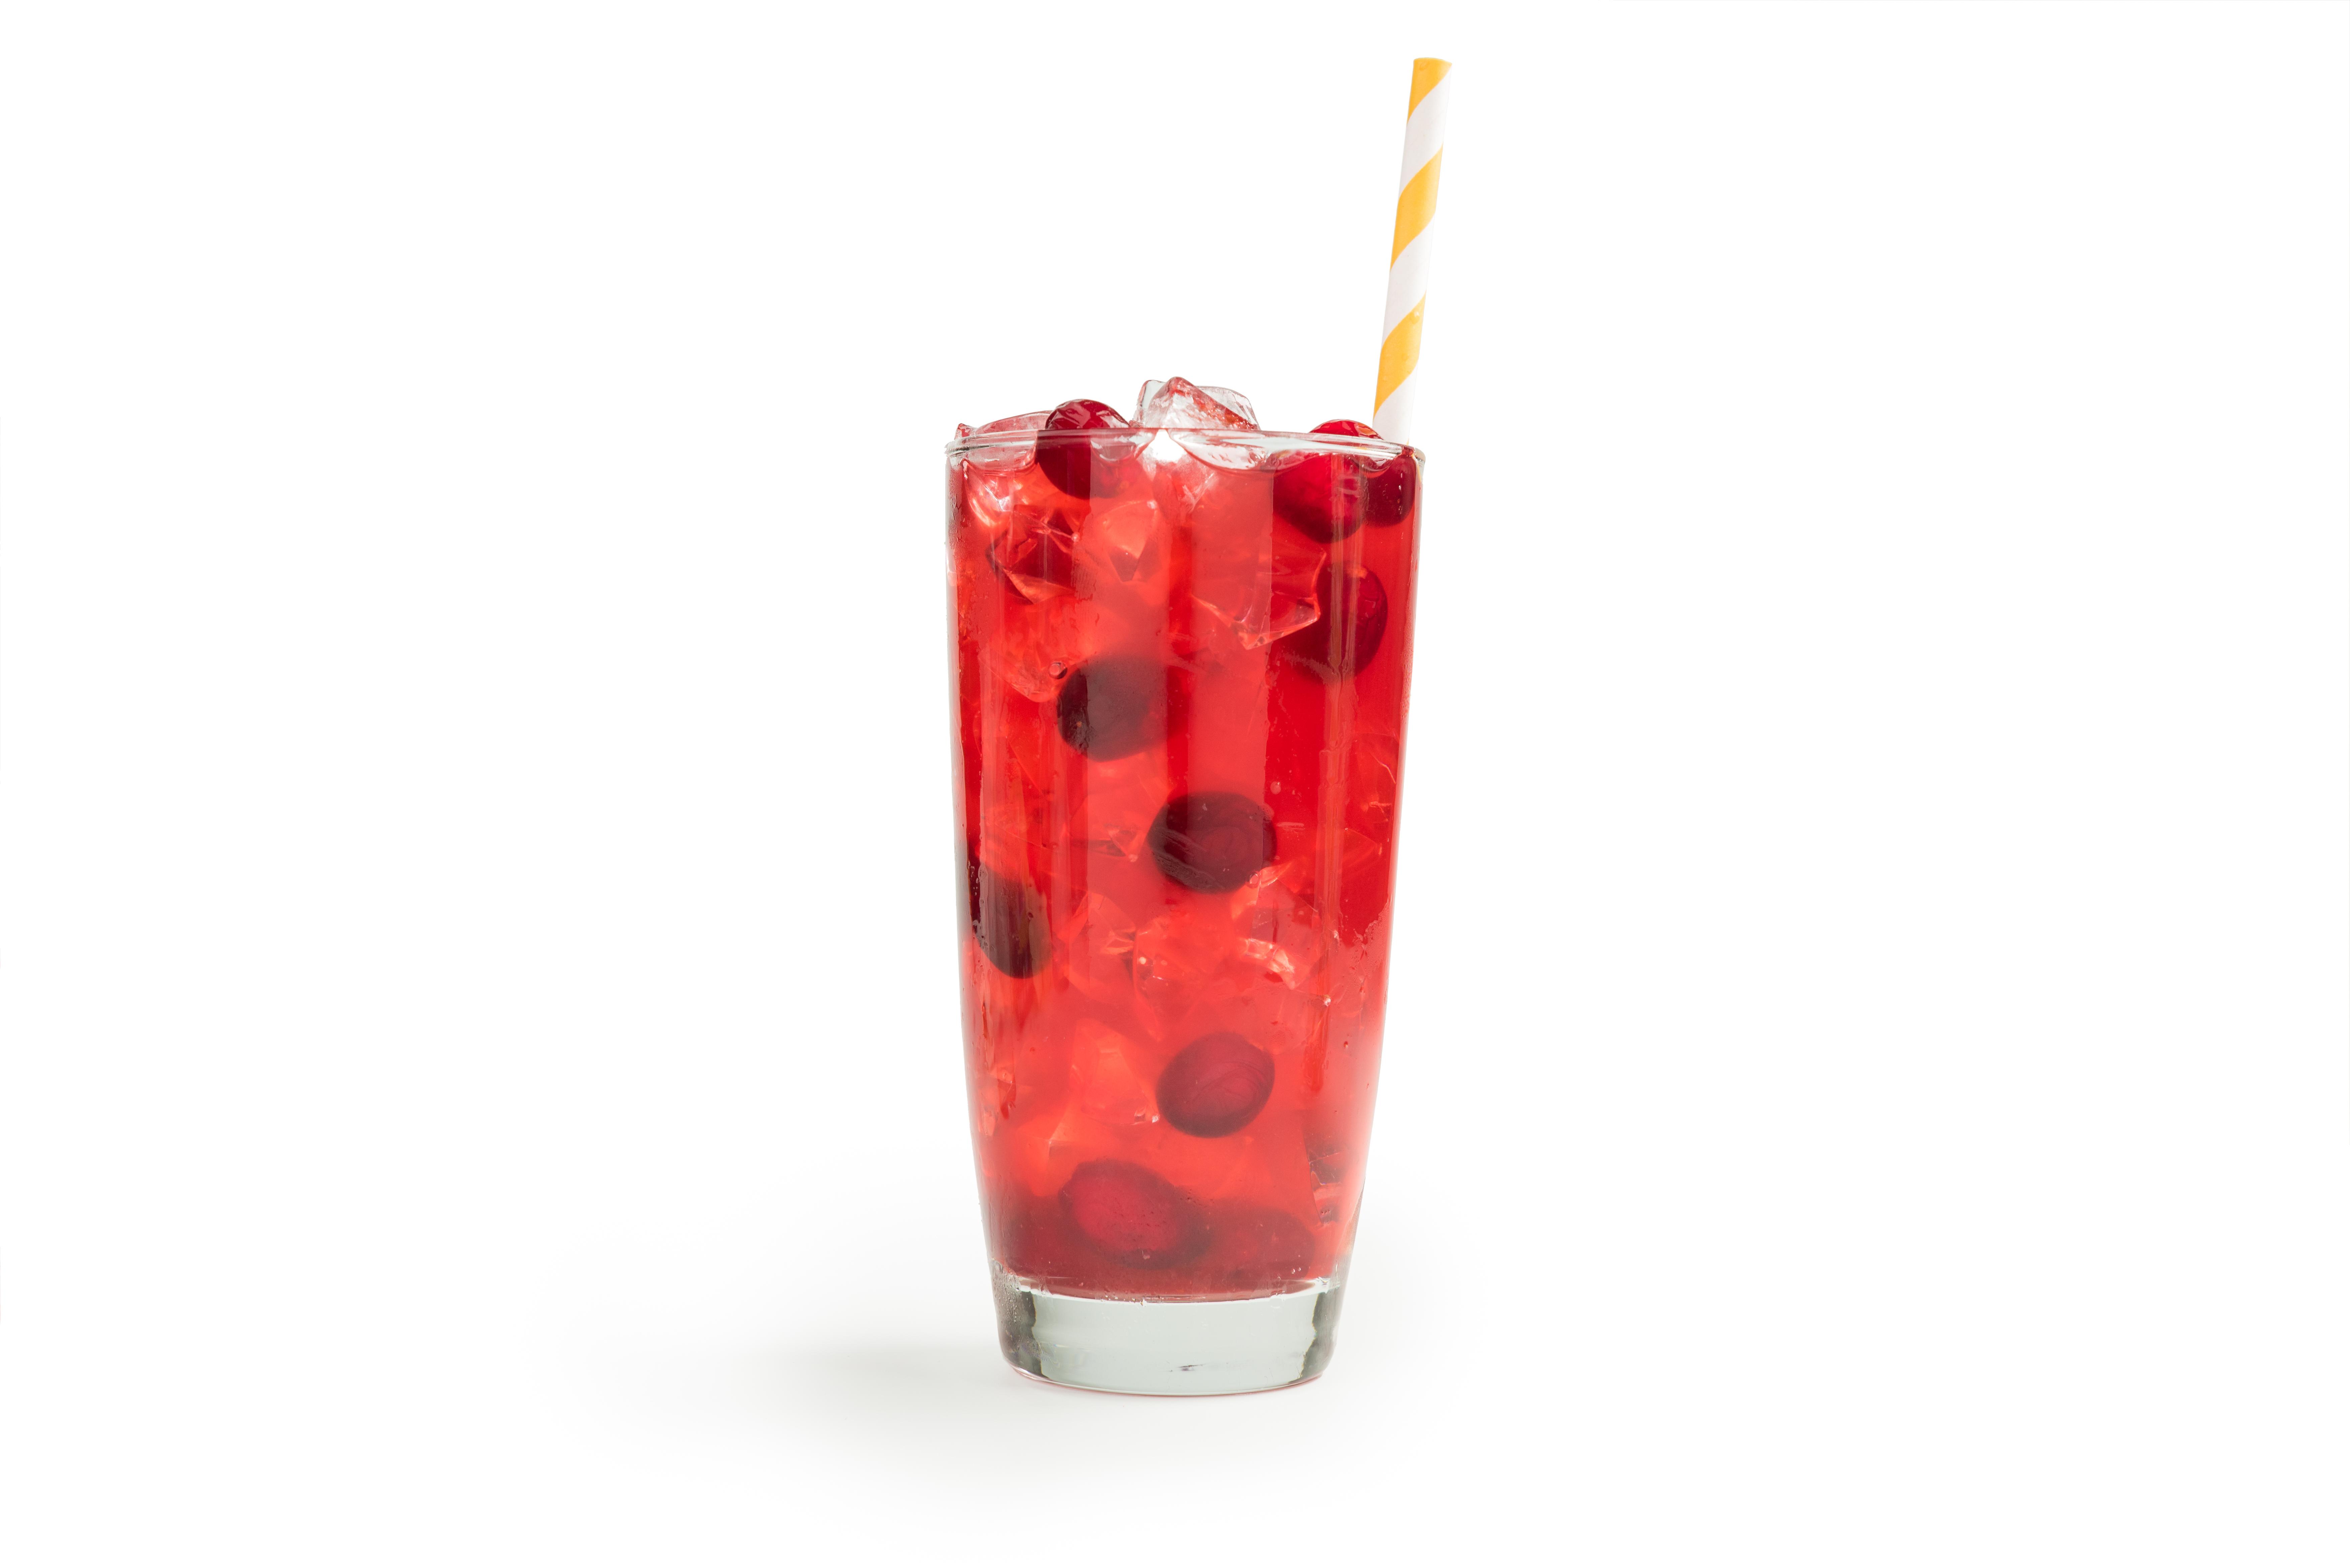 Cranberry Lemonade and Apple Spiced Iced-Tea